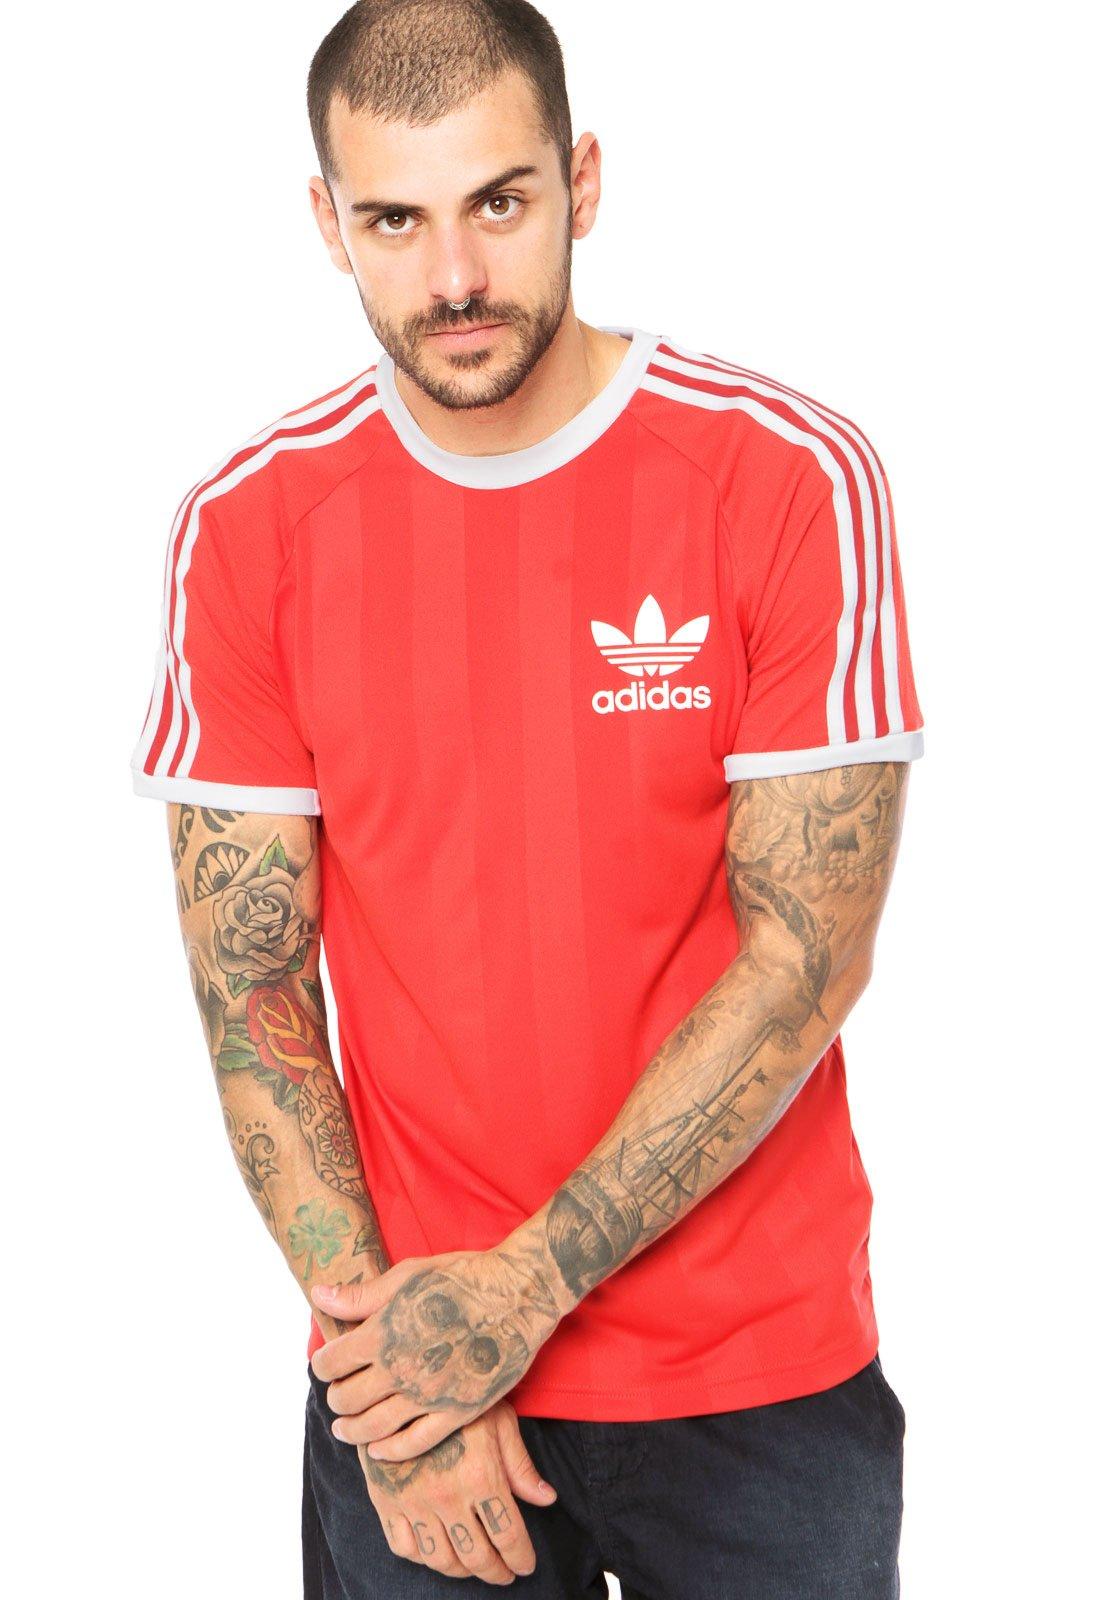 Desviación puesta de sol Antagonismo  Camiseta Manga Curta adidas Originals California Vermelha - Compre Agora |  Dafiti Brasil